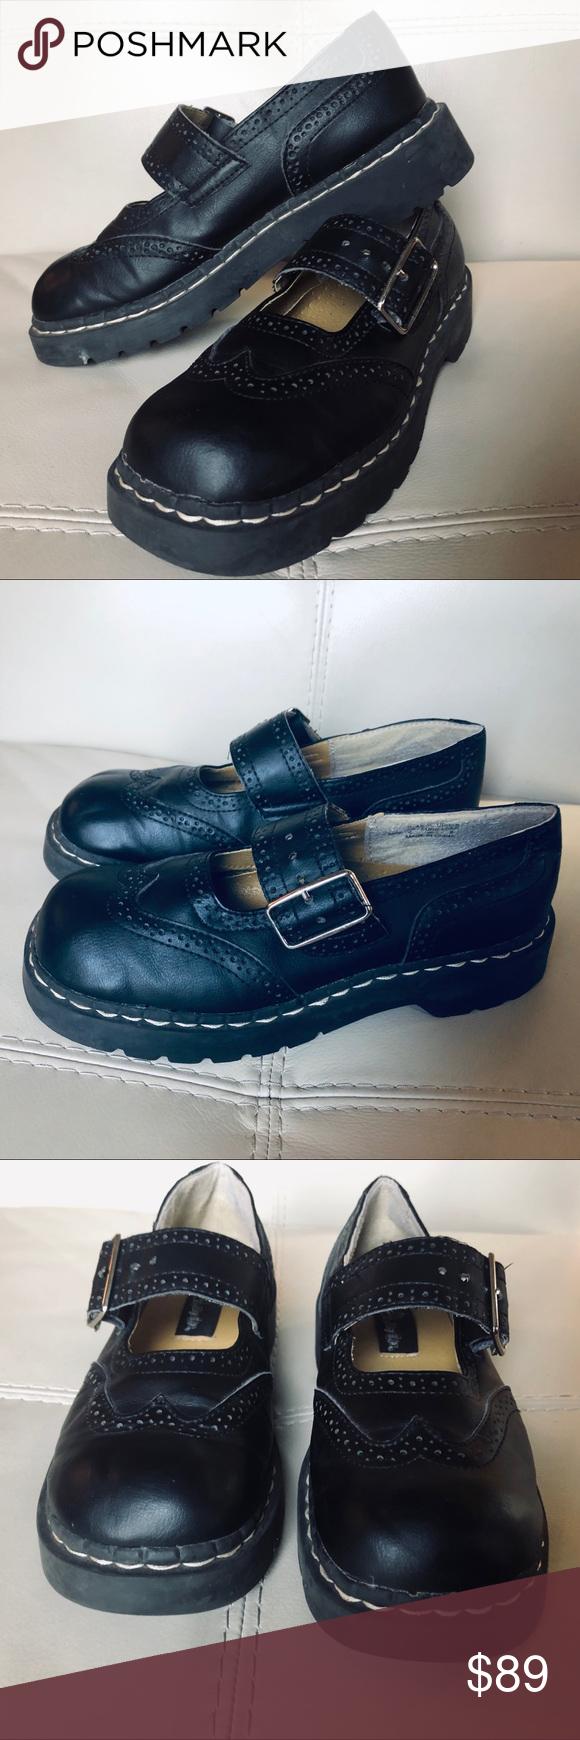 Vtg Tuk Goth Anarchic Black Maryjane Chunky Shoes Chunky Shoes Moto Boots Shoes